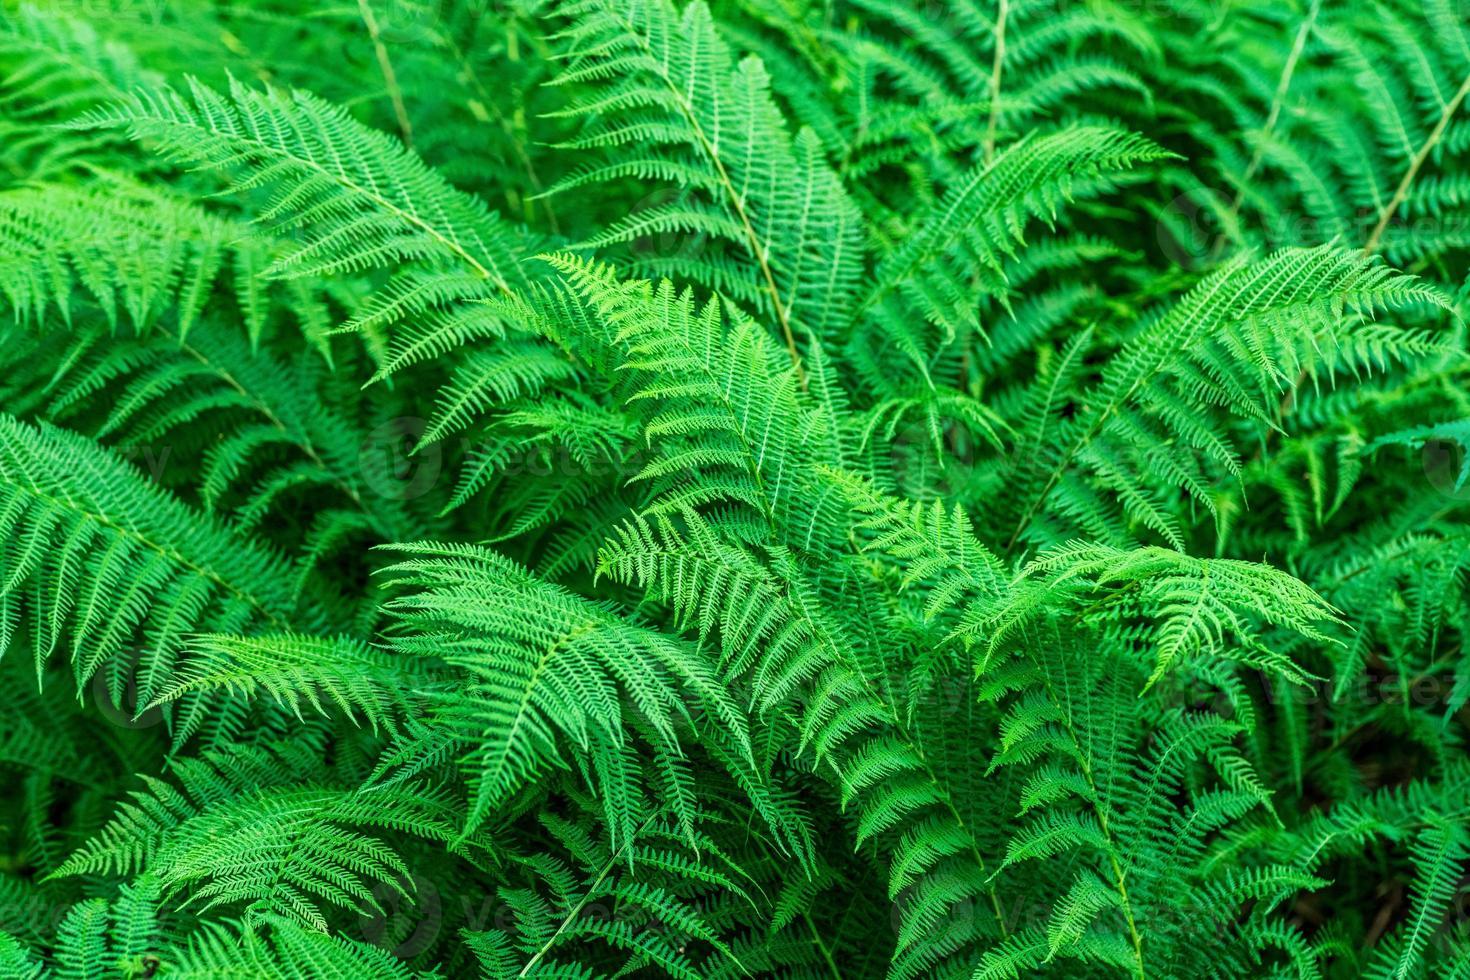 lebendige grüne Farnblätter foto